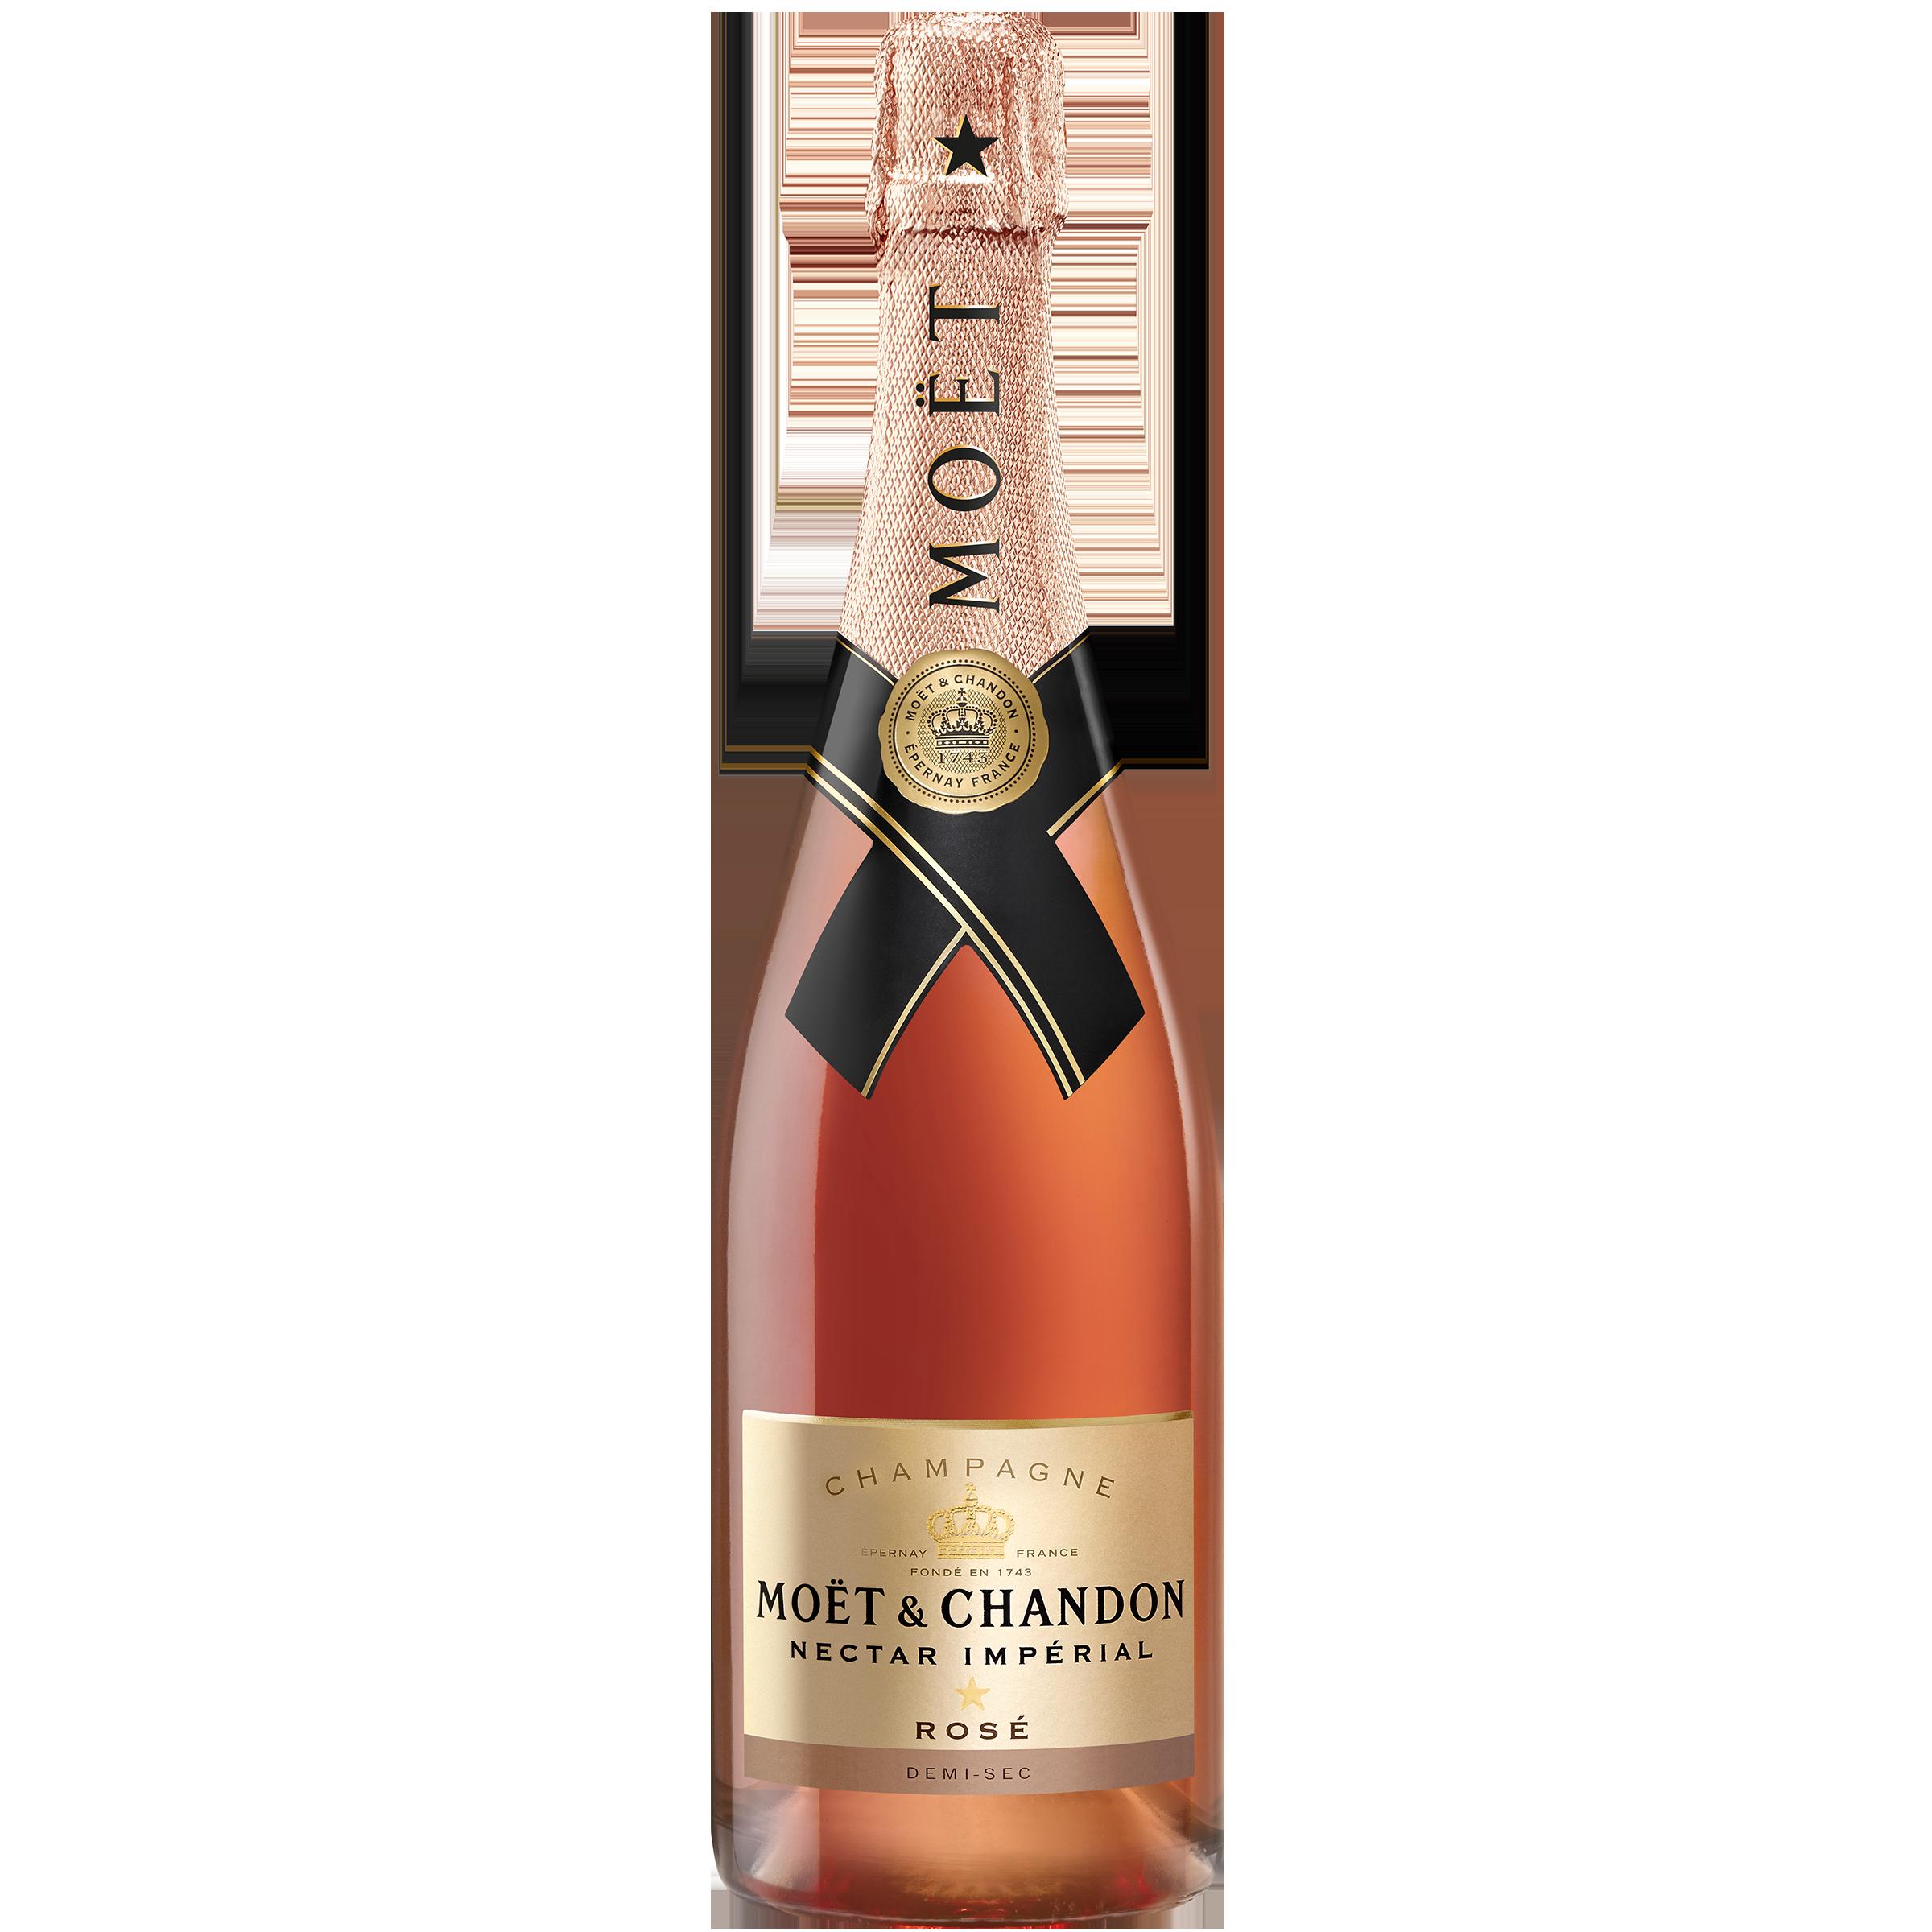 Moët & Chandon Nectar Impérial Rosé Demi-Sec 750ML